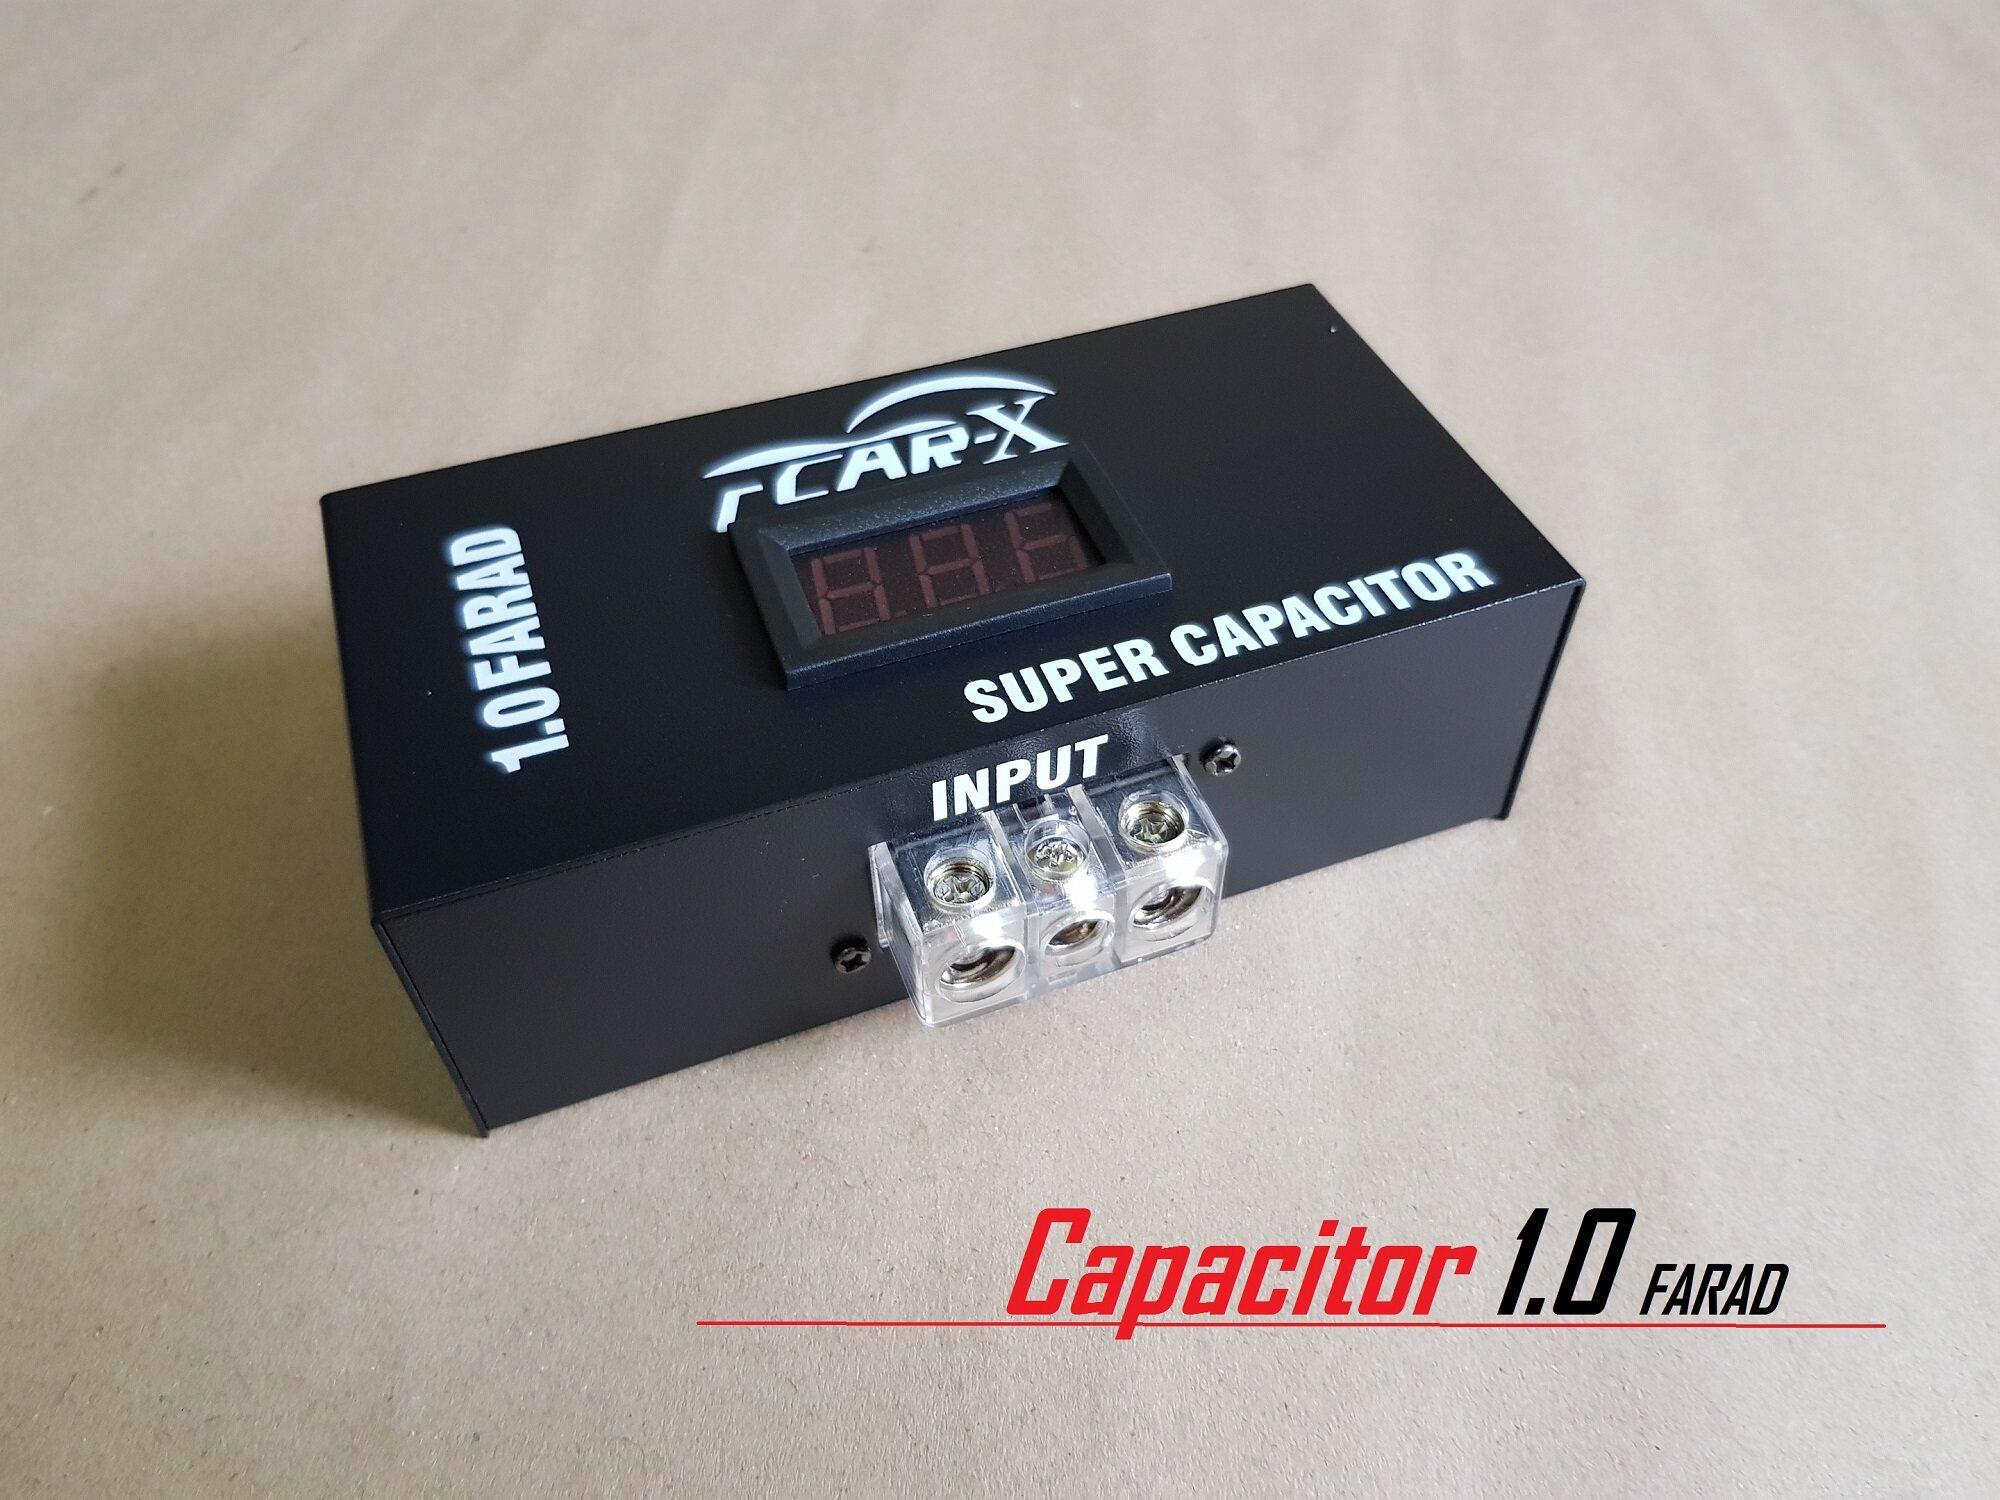 Car-x คาปาซิเตอร์แท้ 1 0FARAD Super capacitor คาปาซิเตอร์ Car-x รุ่น 1 0F